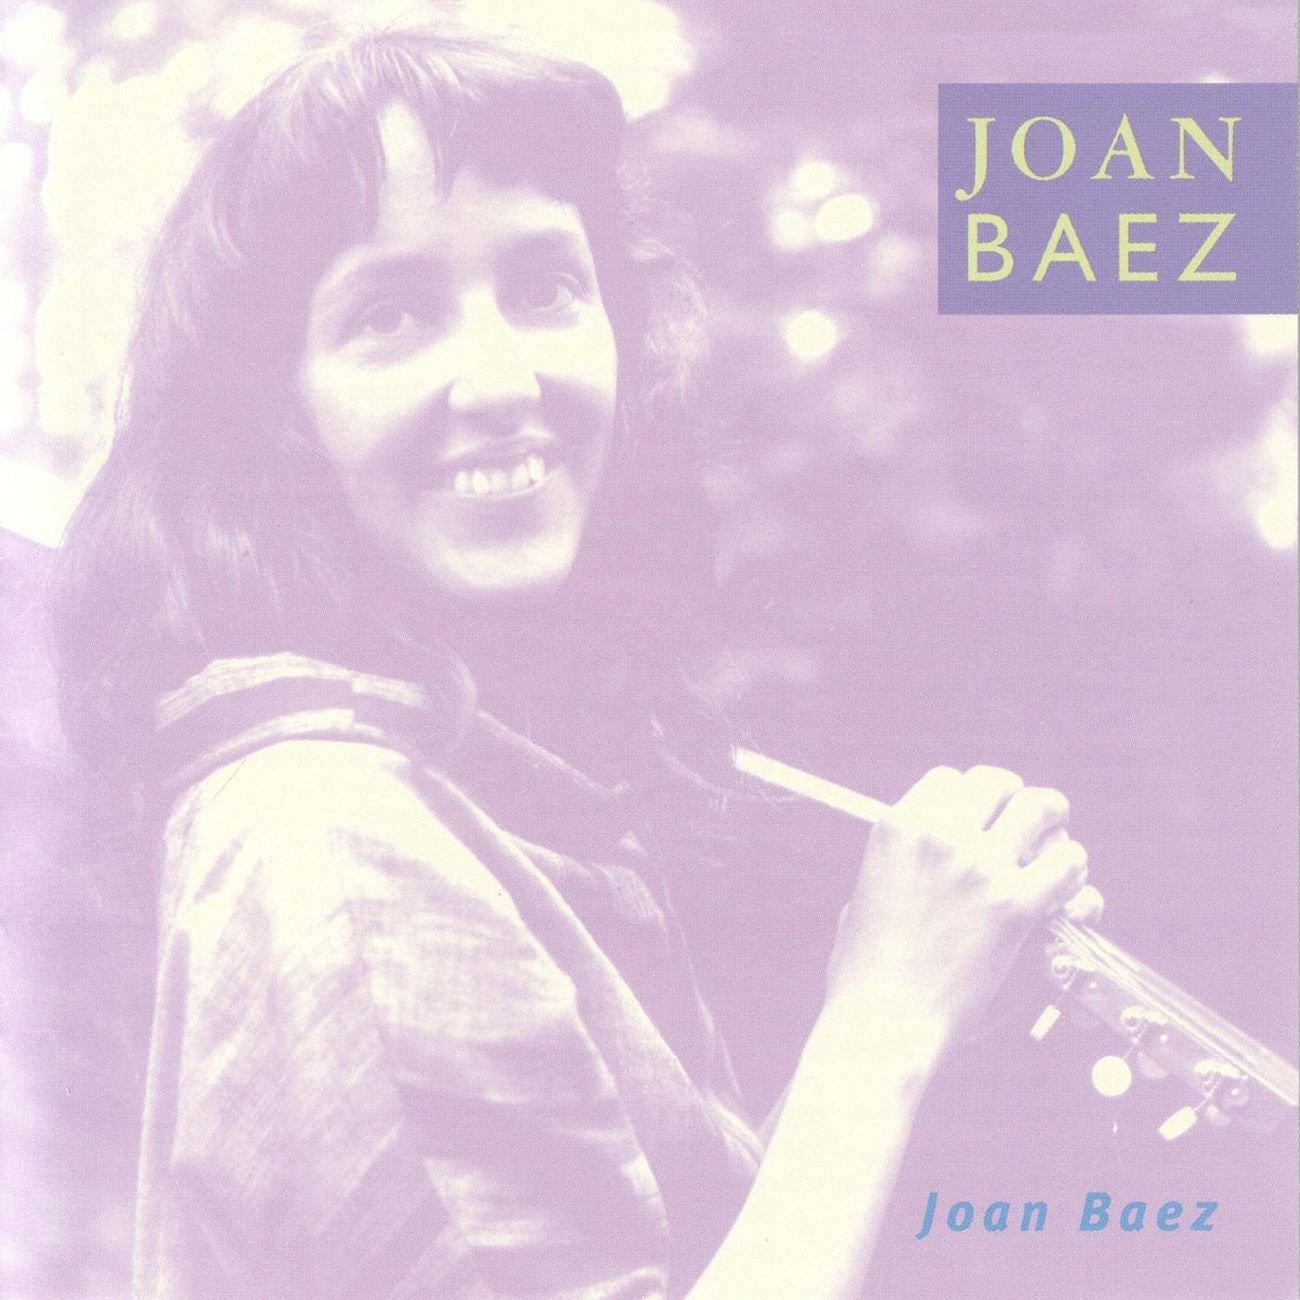 Joan Baez Photos (21 of 99) — Last.fm